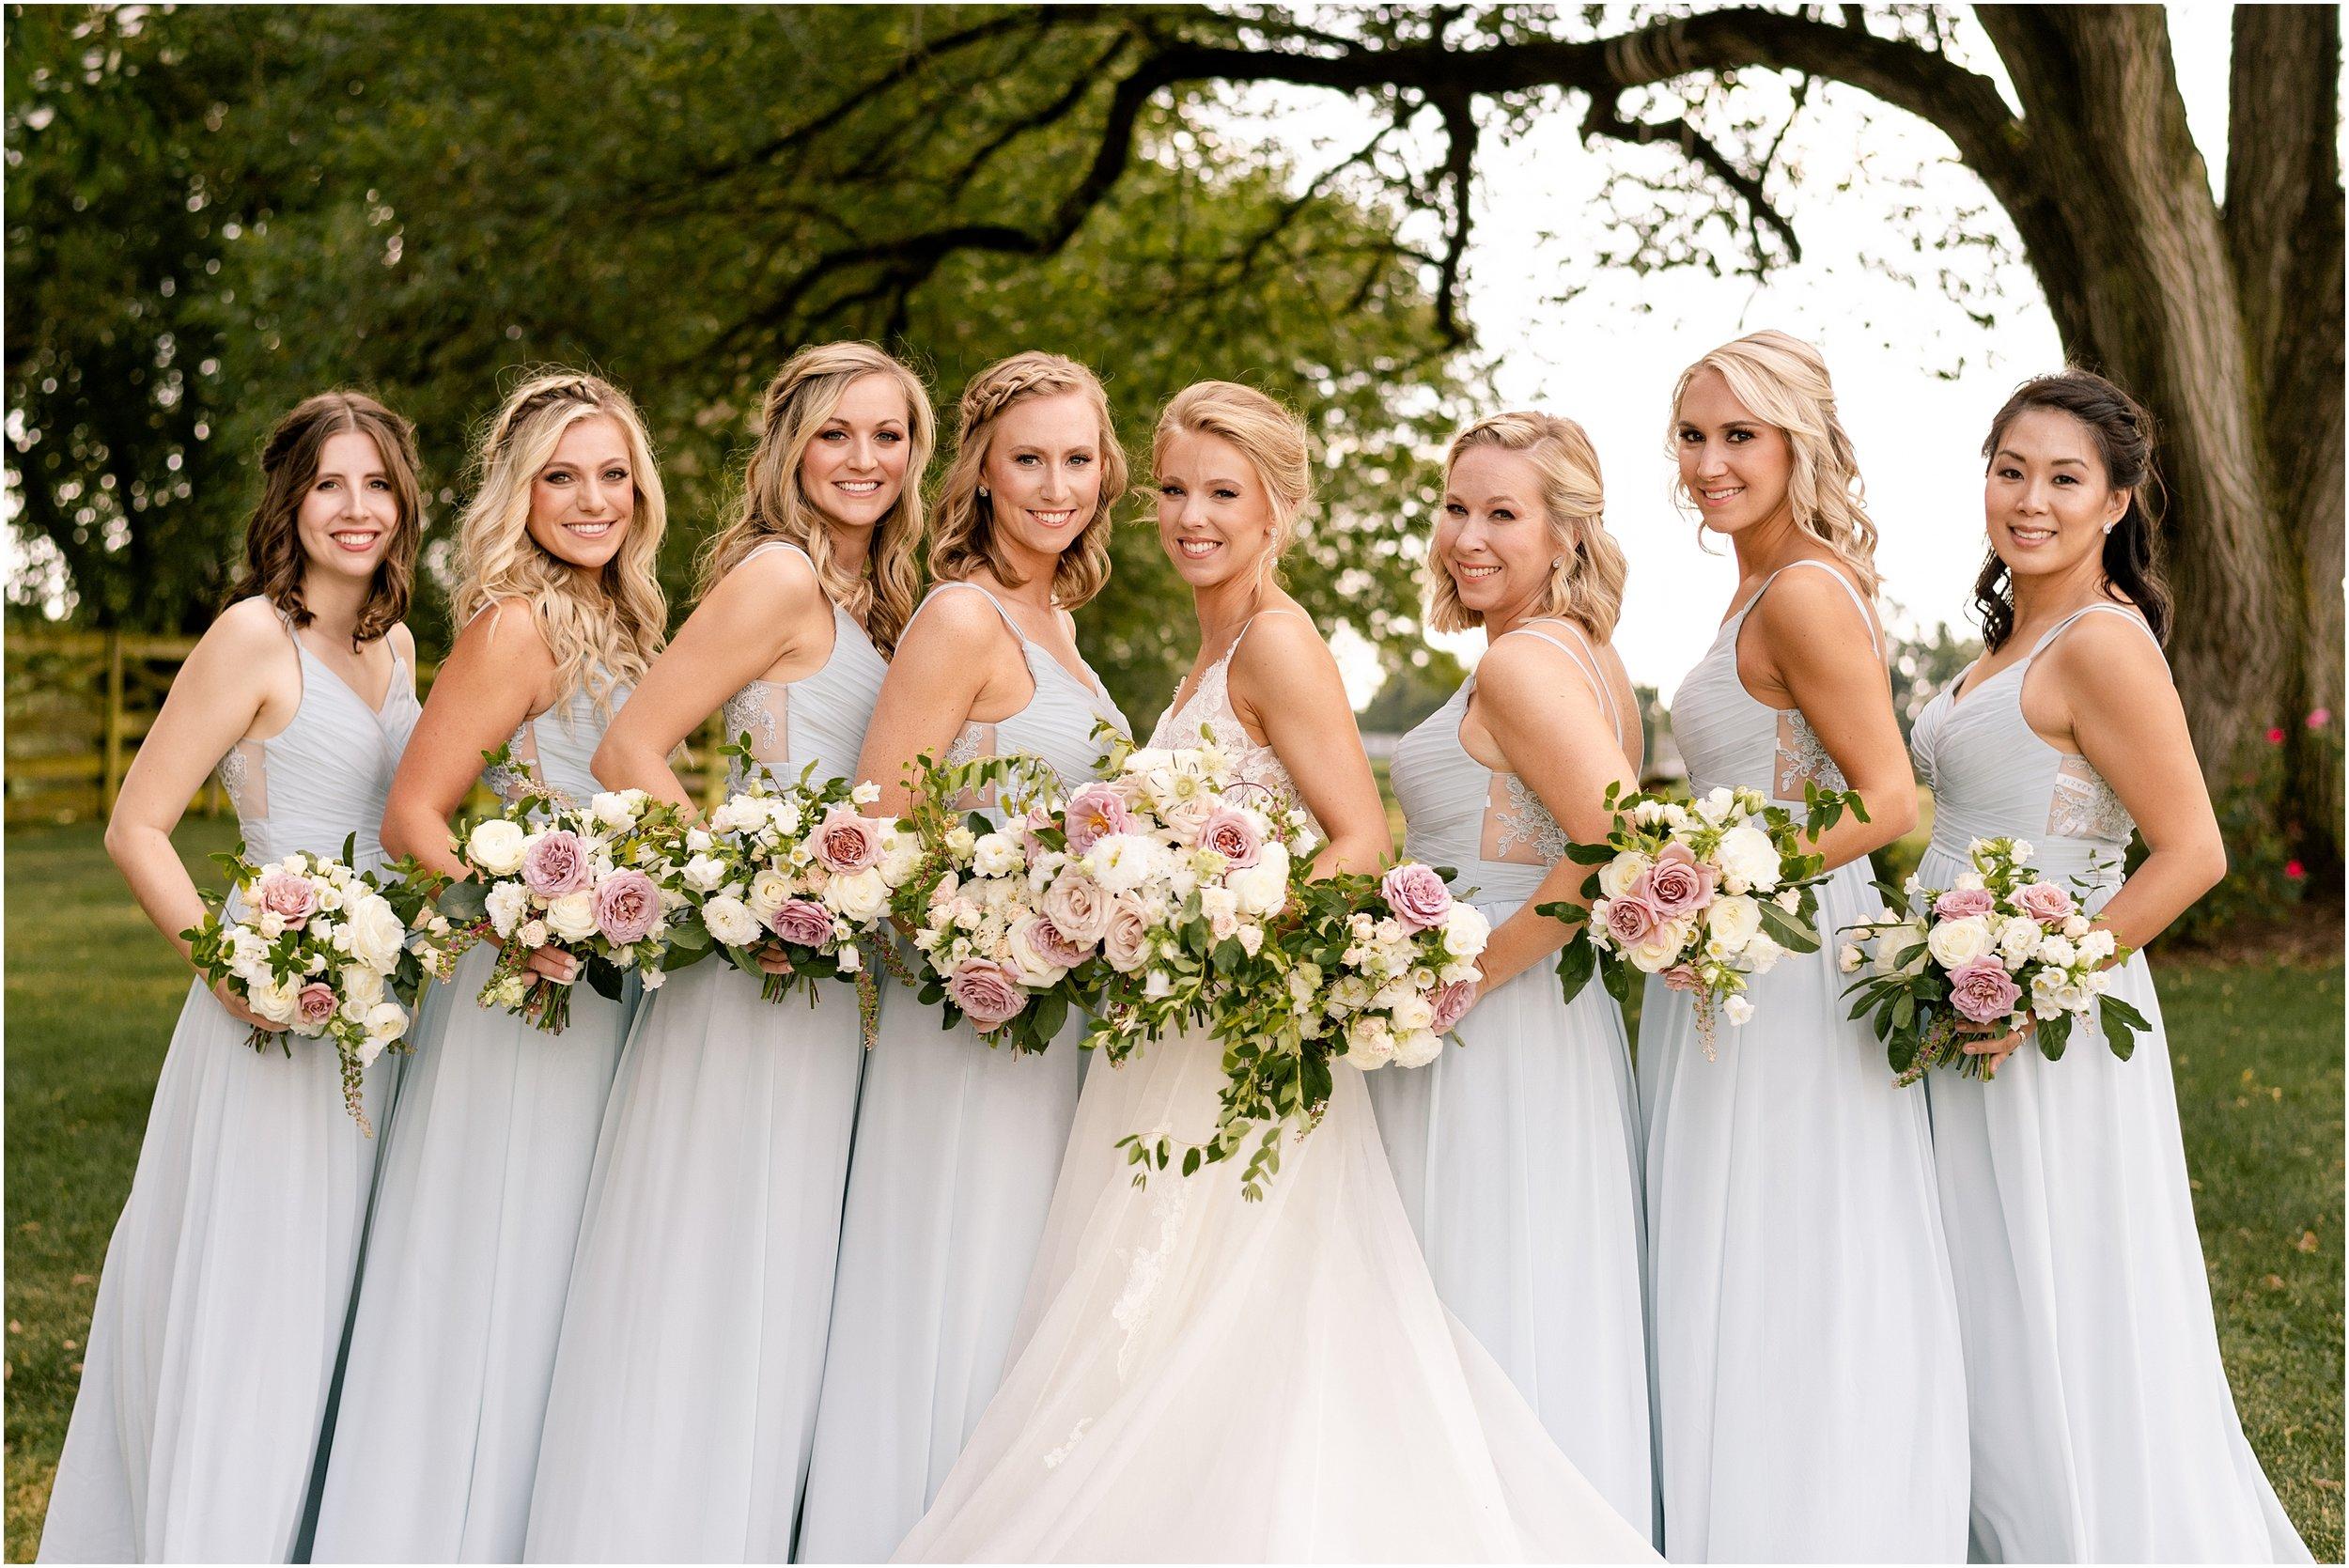 hannah leigh photography Walkers Overlook Wedding Walkersville MD_3521.jpg